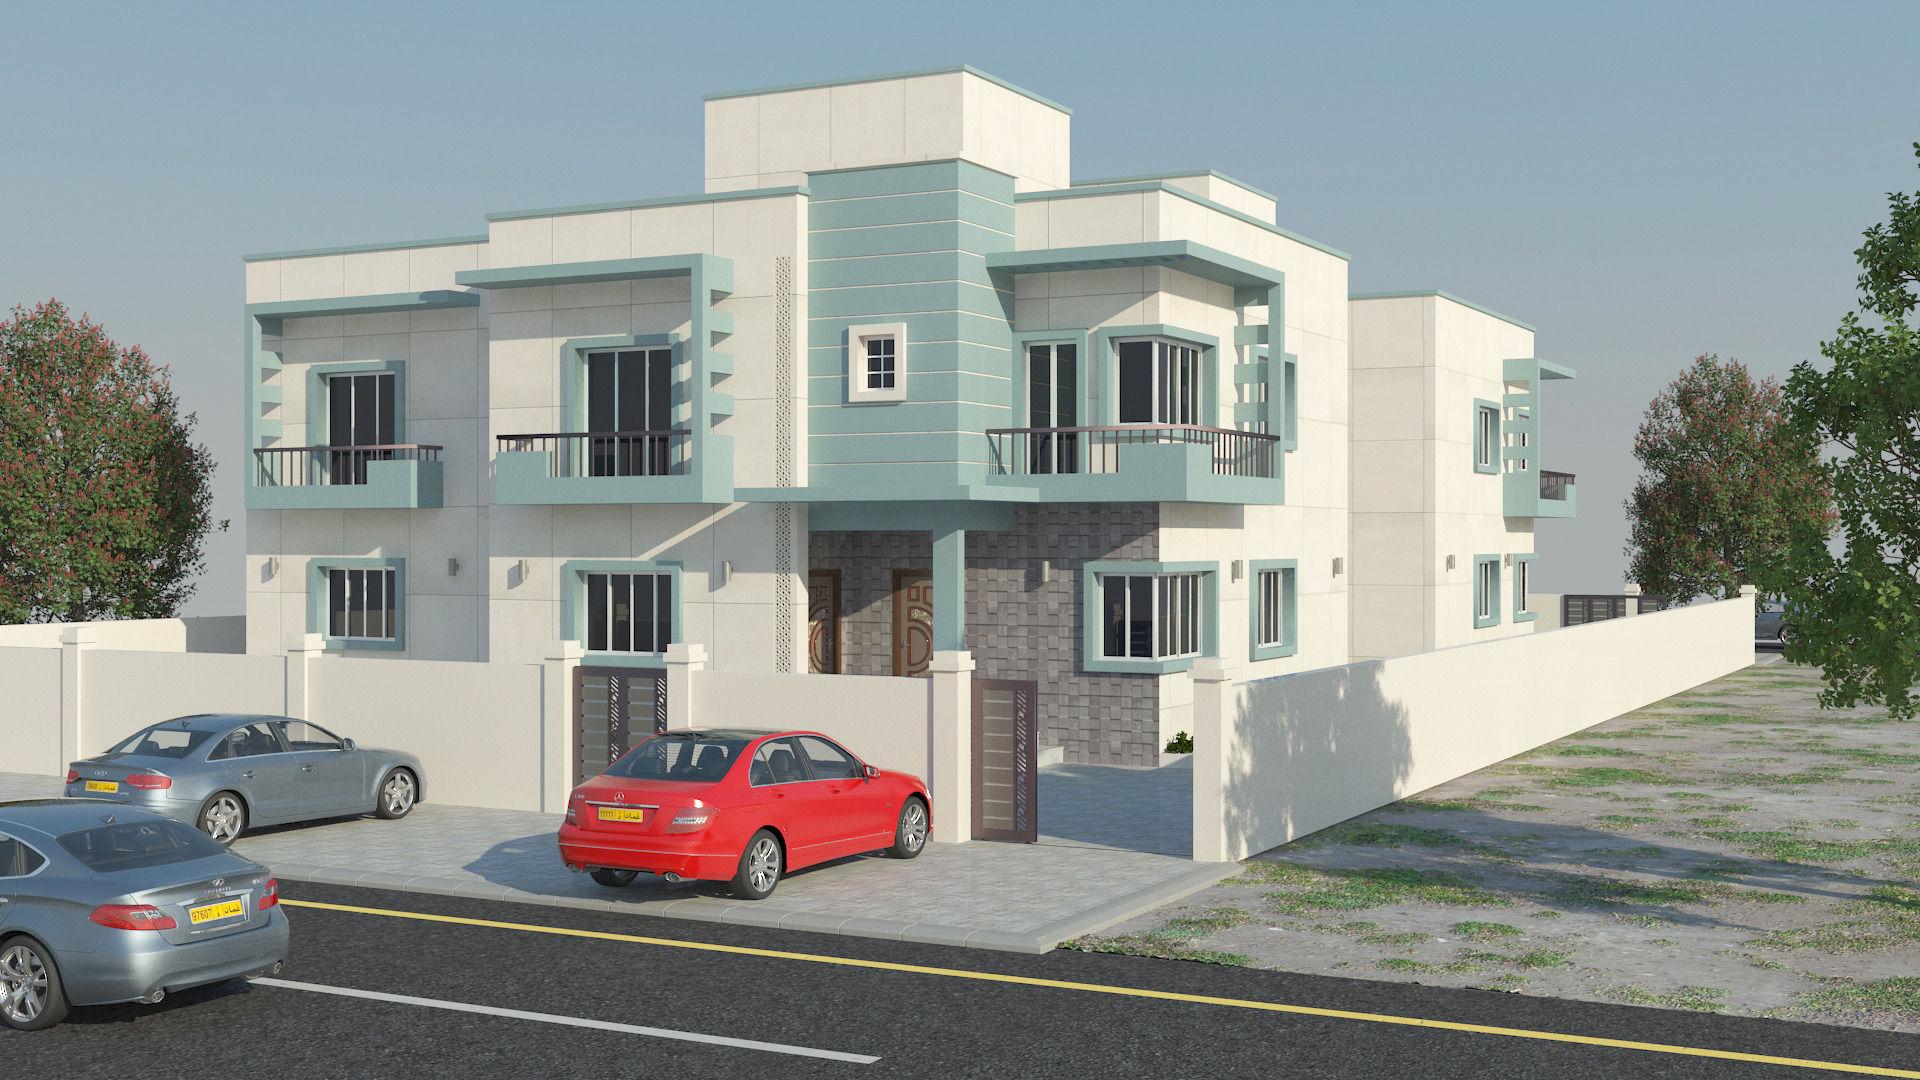 beatifull house free V / / low-poly 3D Model M Grader.com - ^